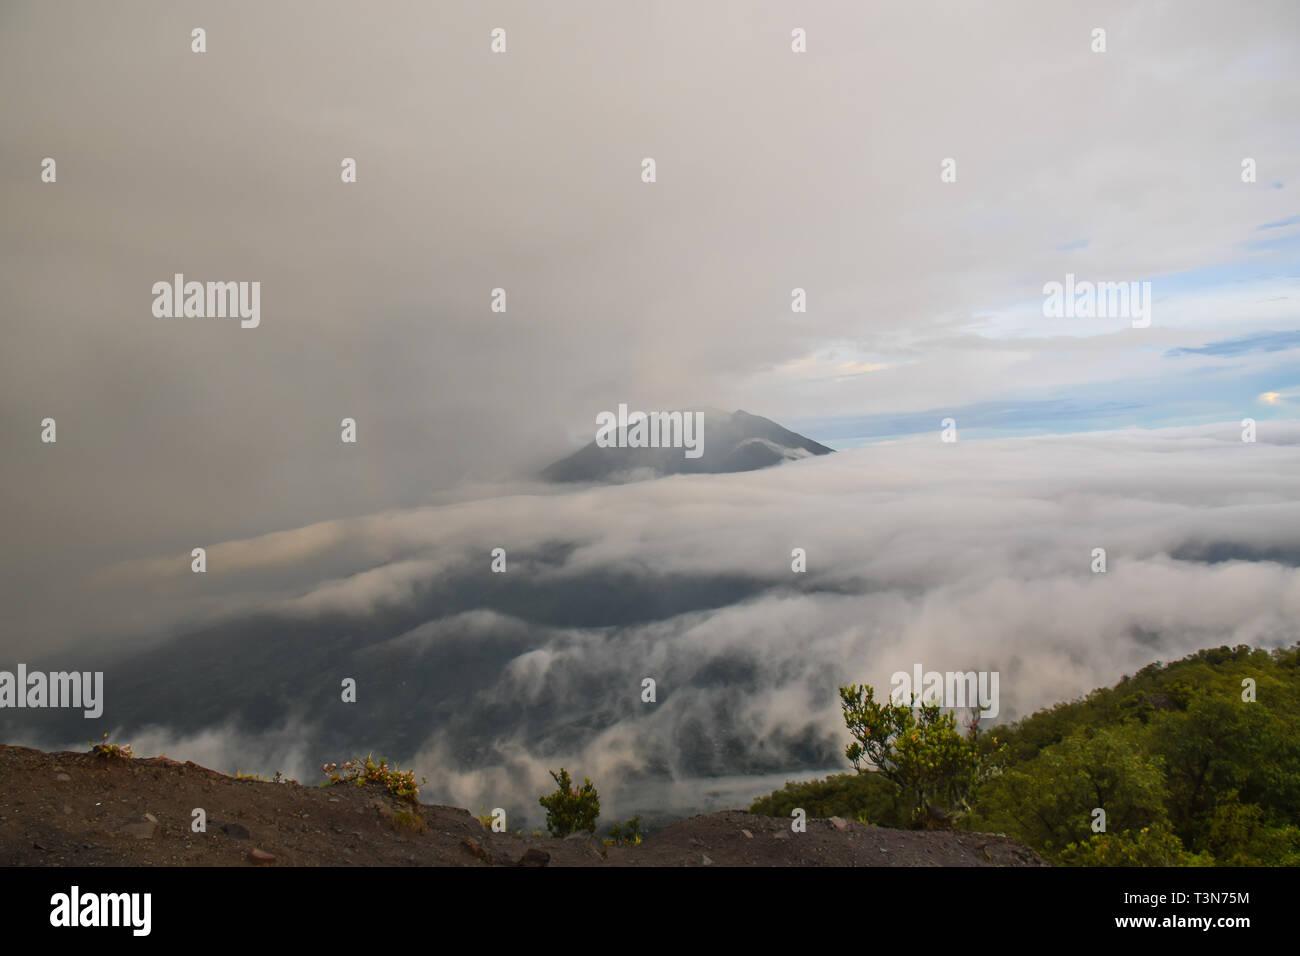 View on Merbabu from Merapi Volcano, Indonesia - Stock Image